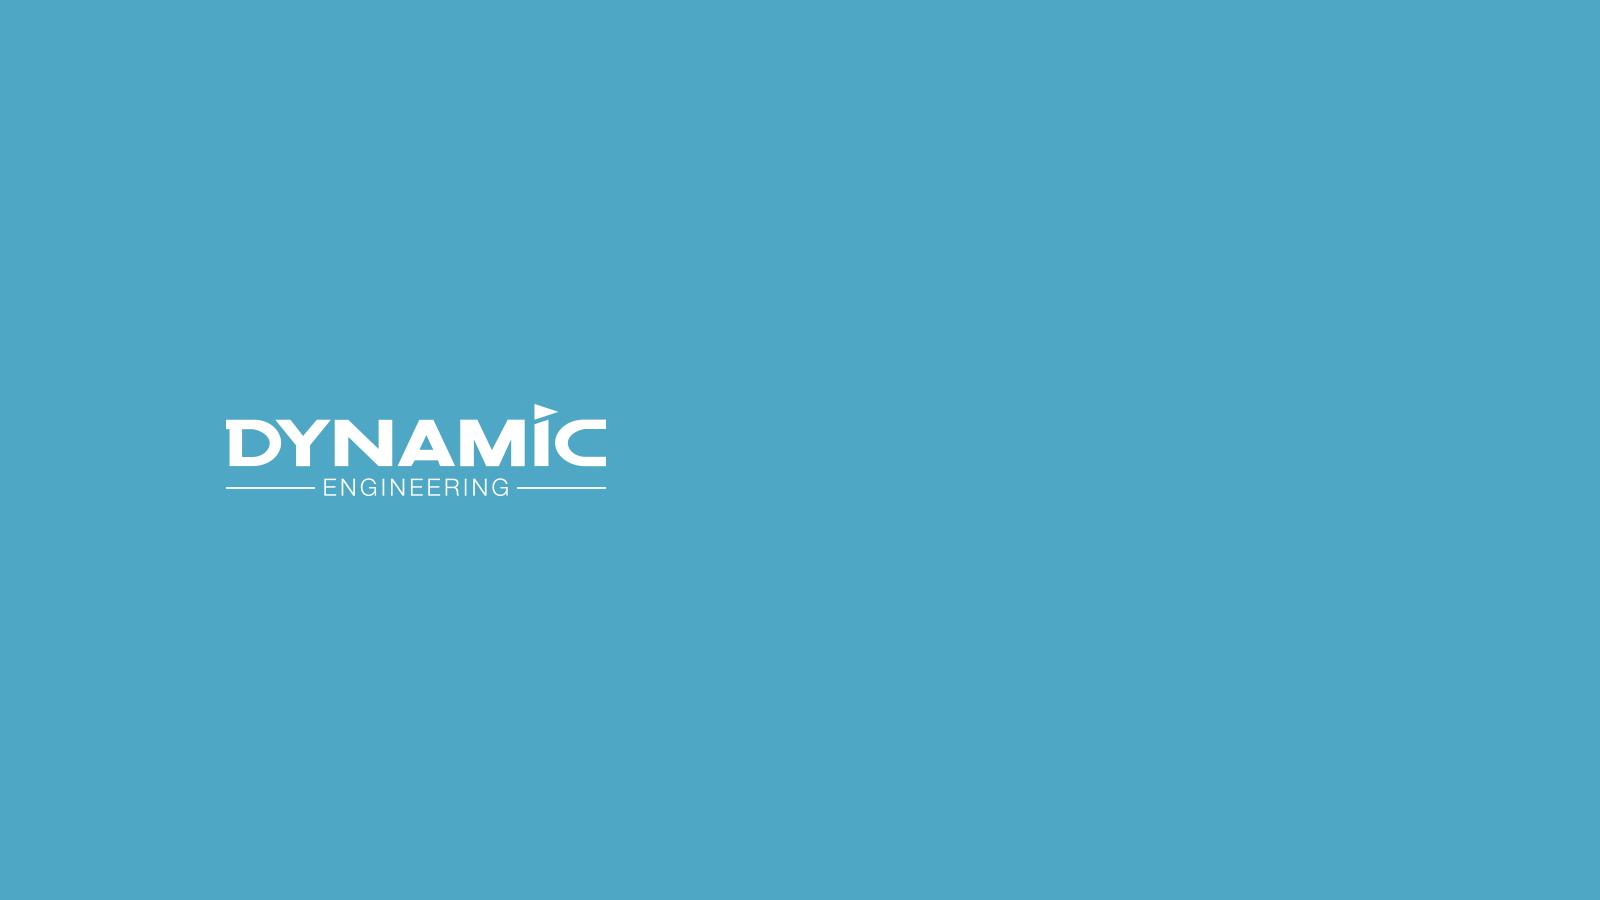 graphic-brand-design-web-designer-hiline-lahore-pakistan-dynamic-banner